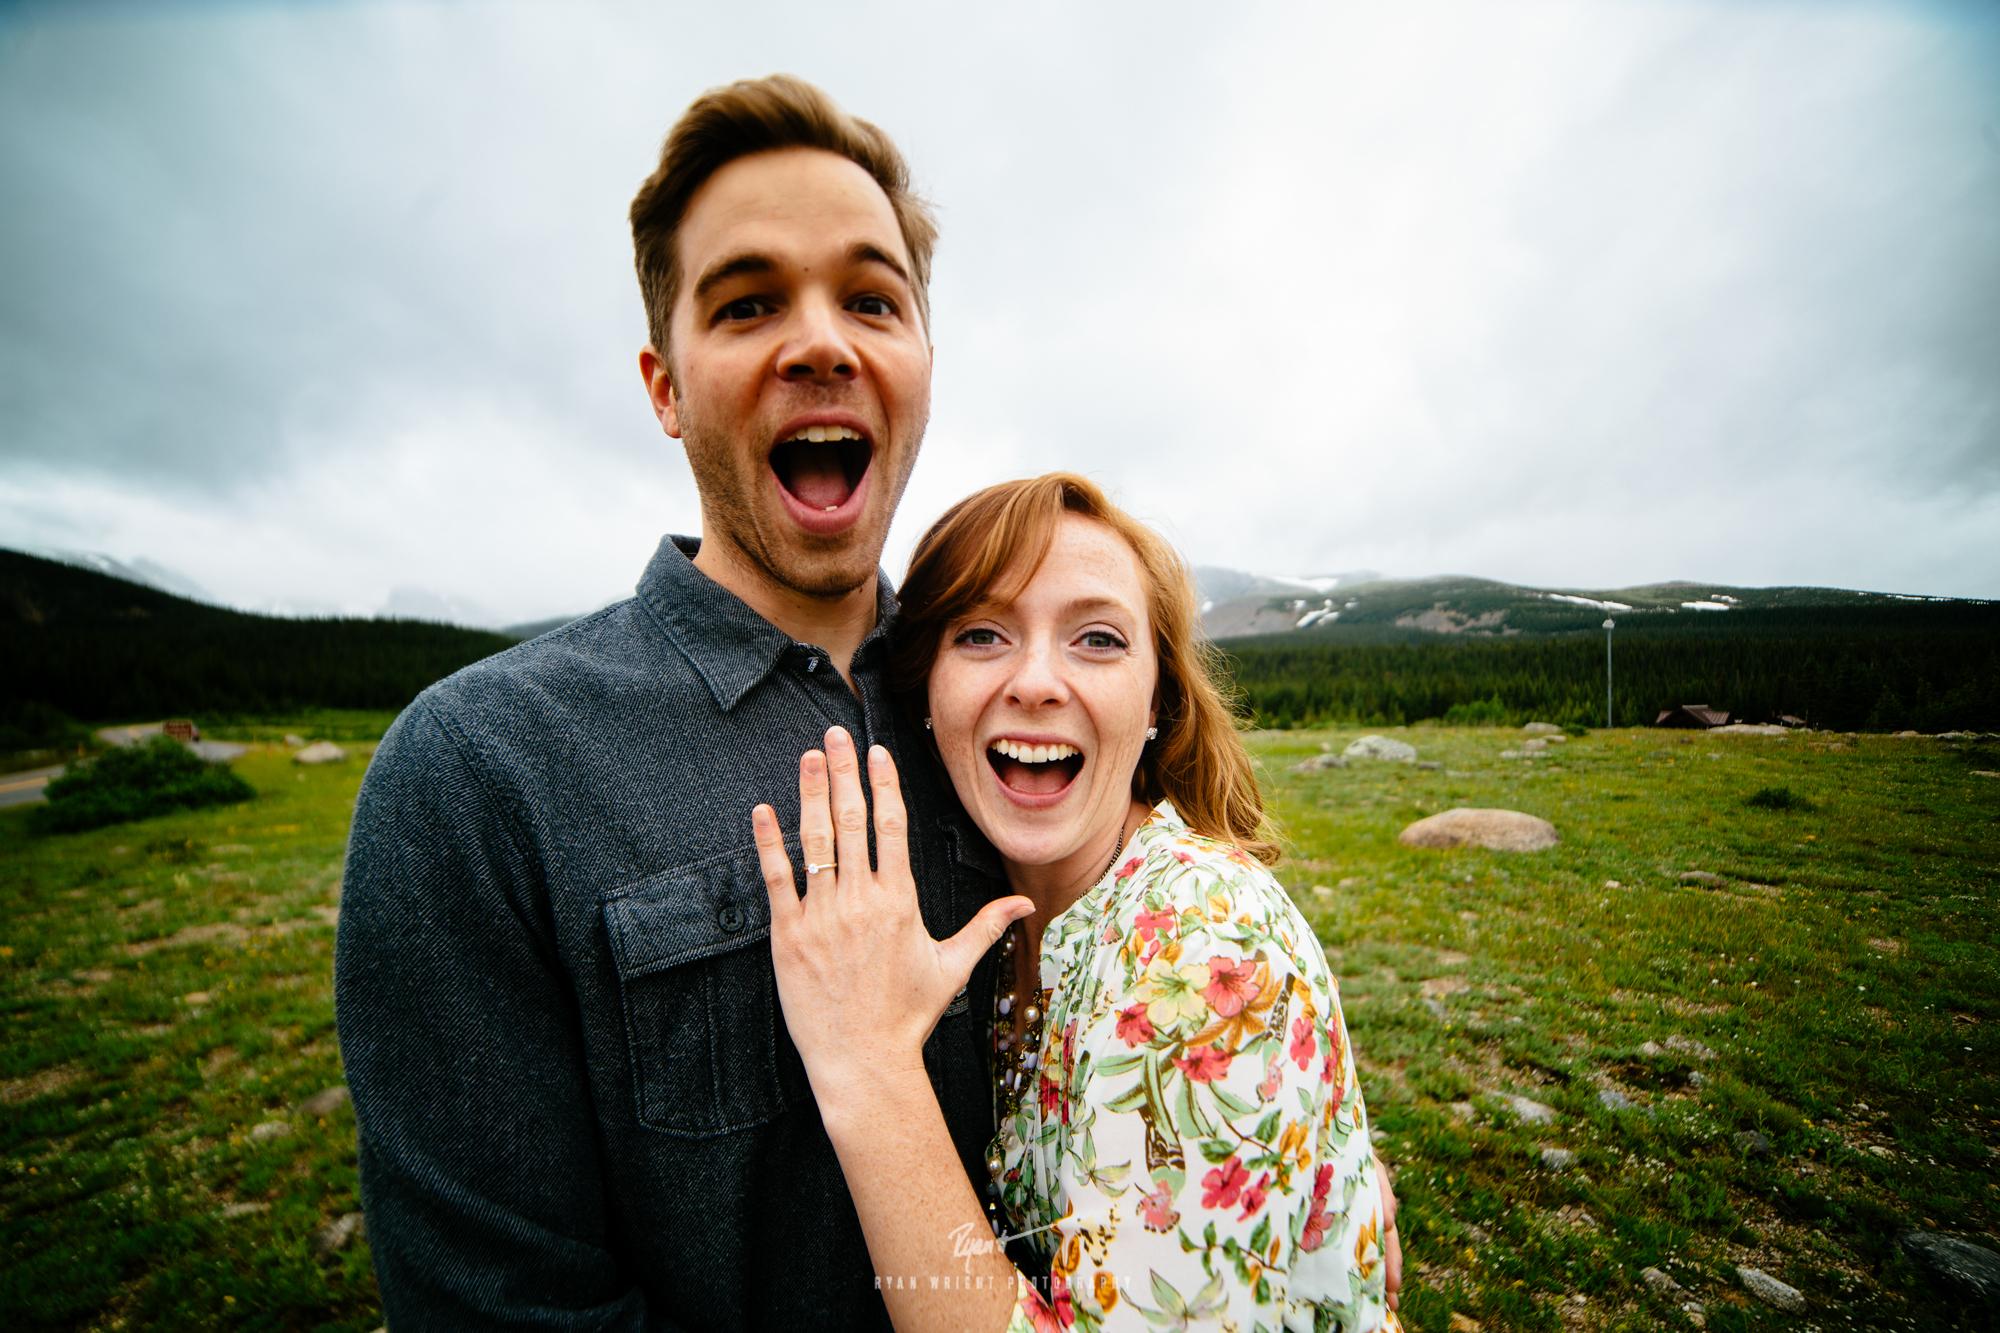 boulder-wedding-photographer-10.jpg